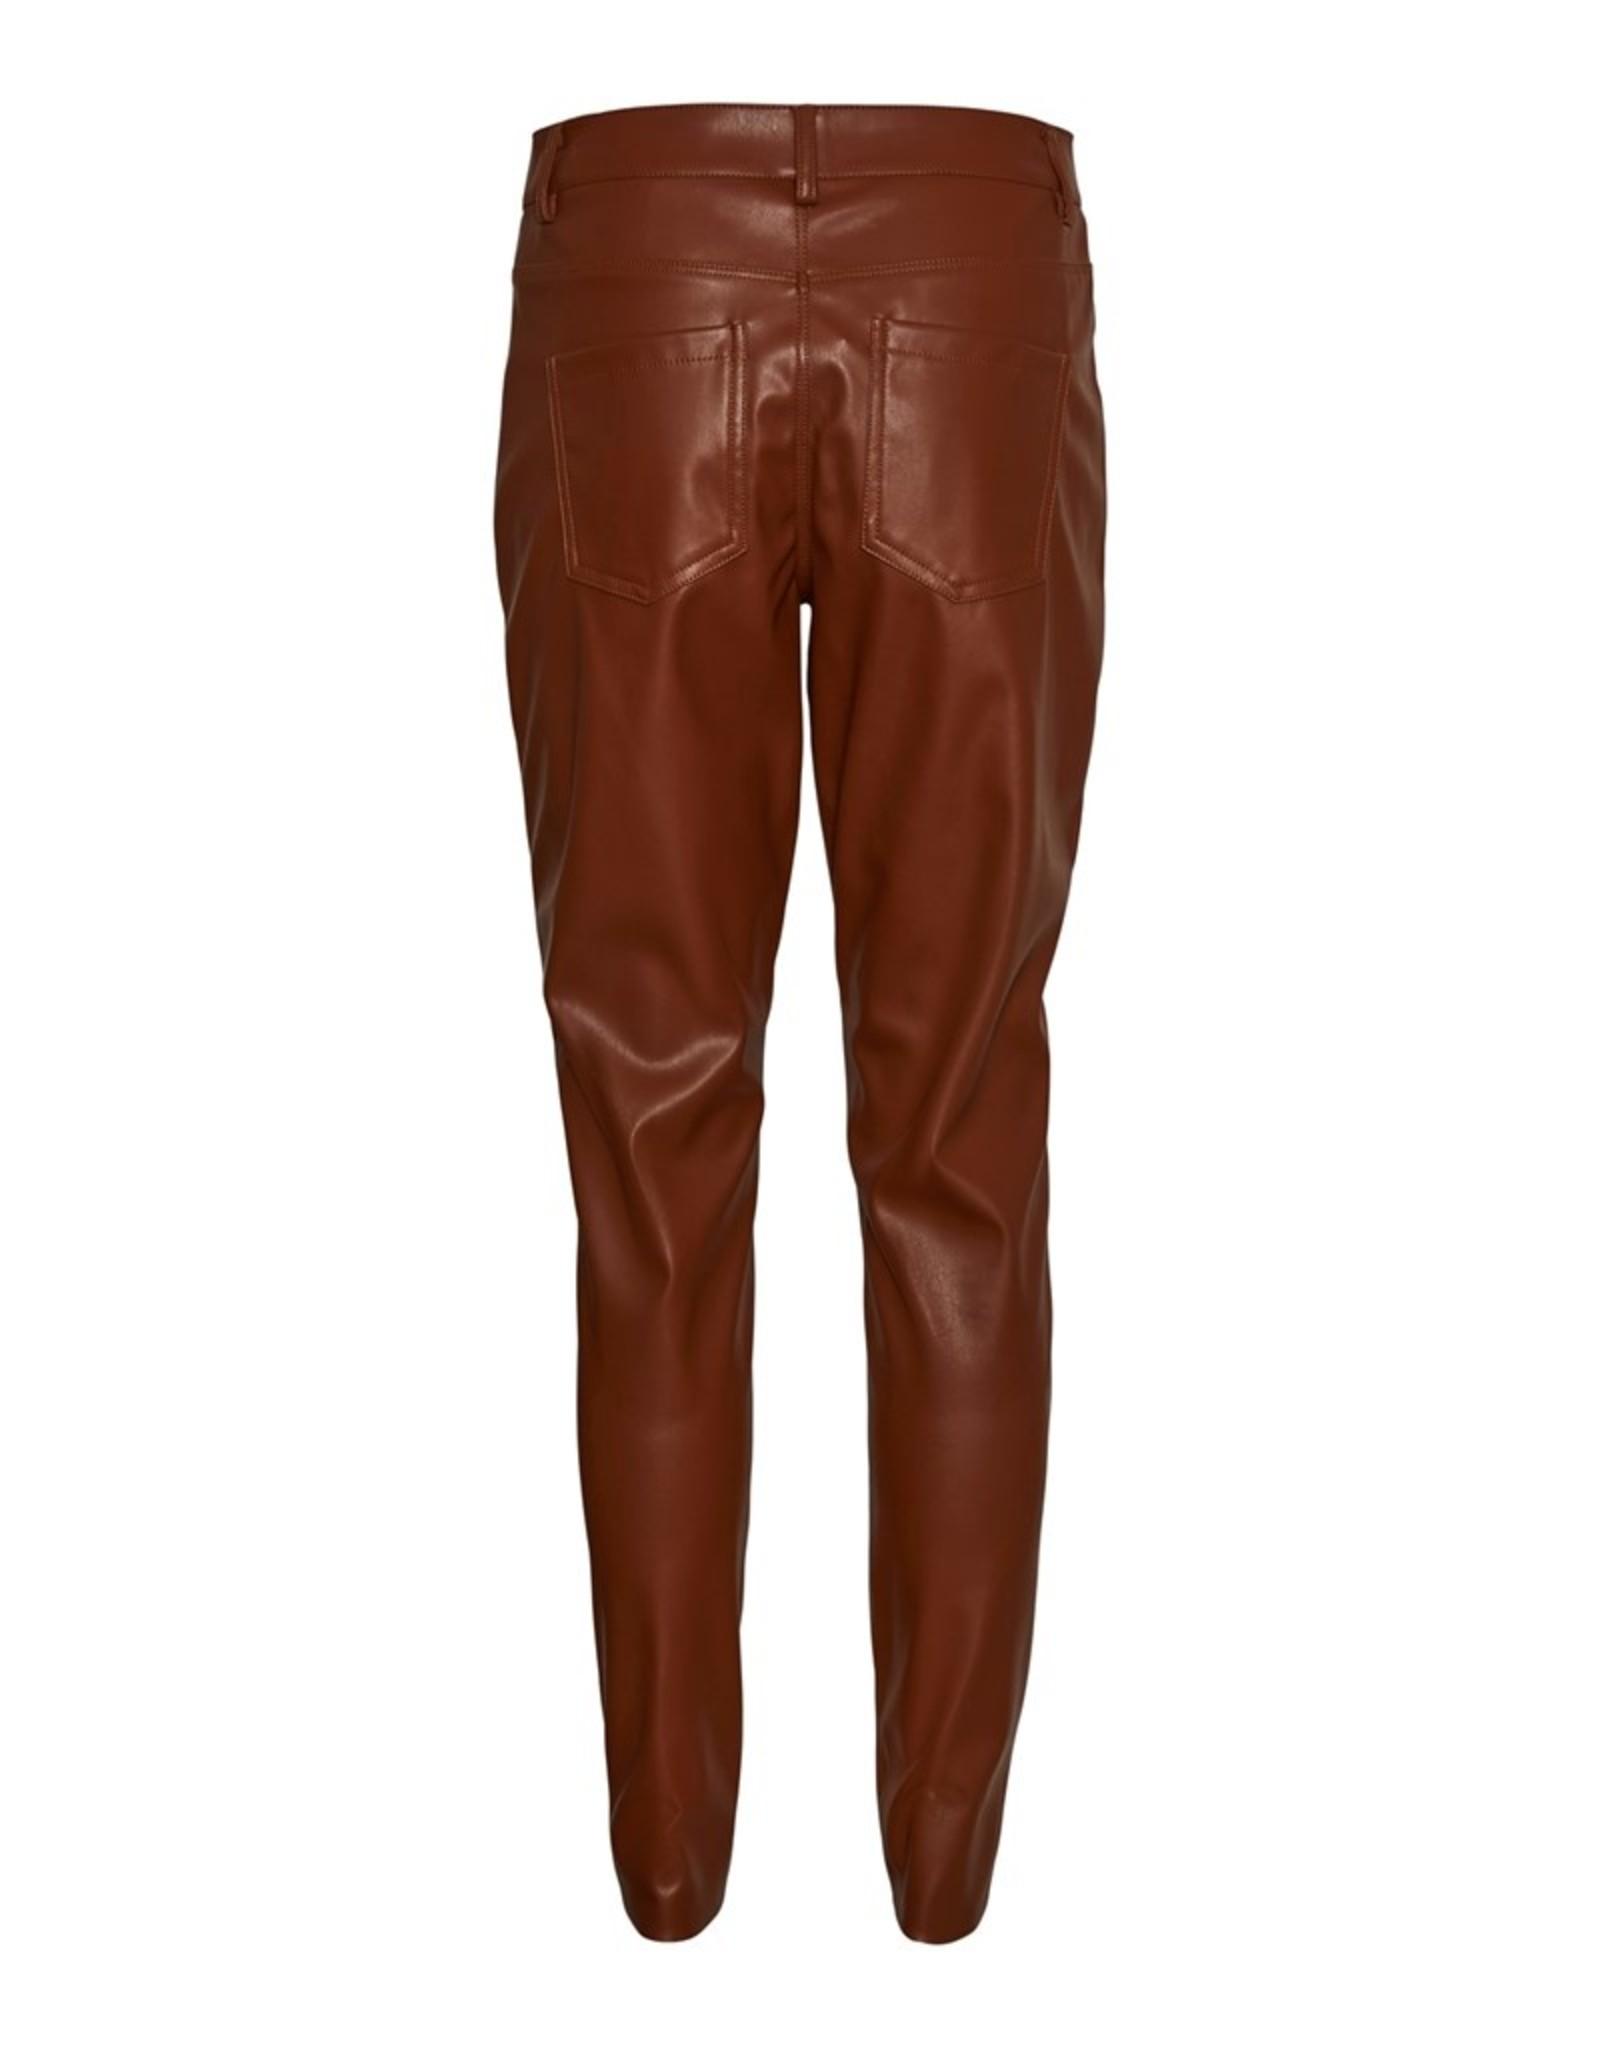 Noisy May Callie Cognac Pants